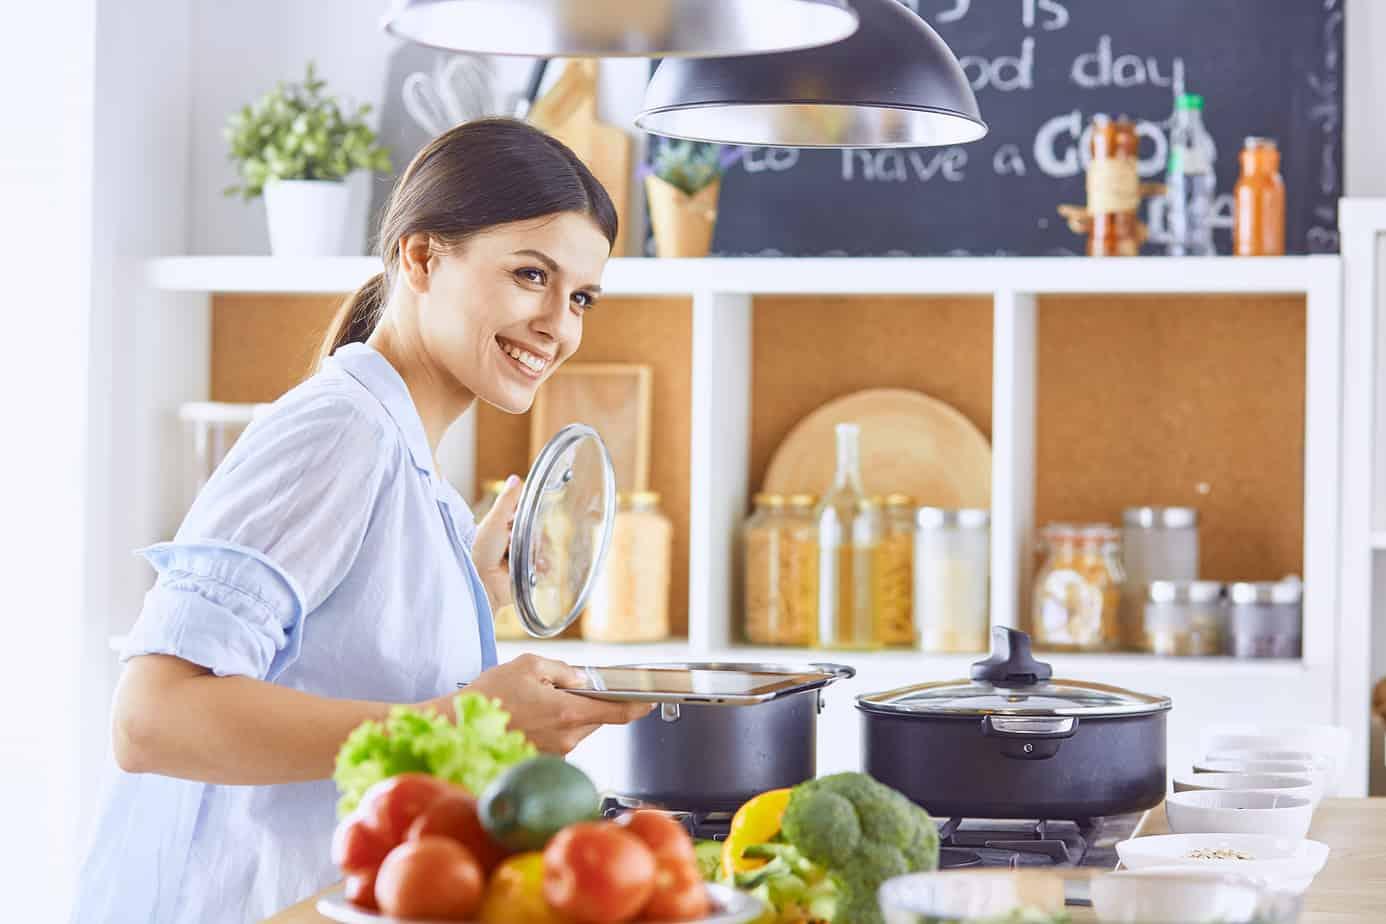 signora felice prepara da mangiare in cucina